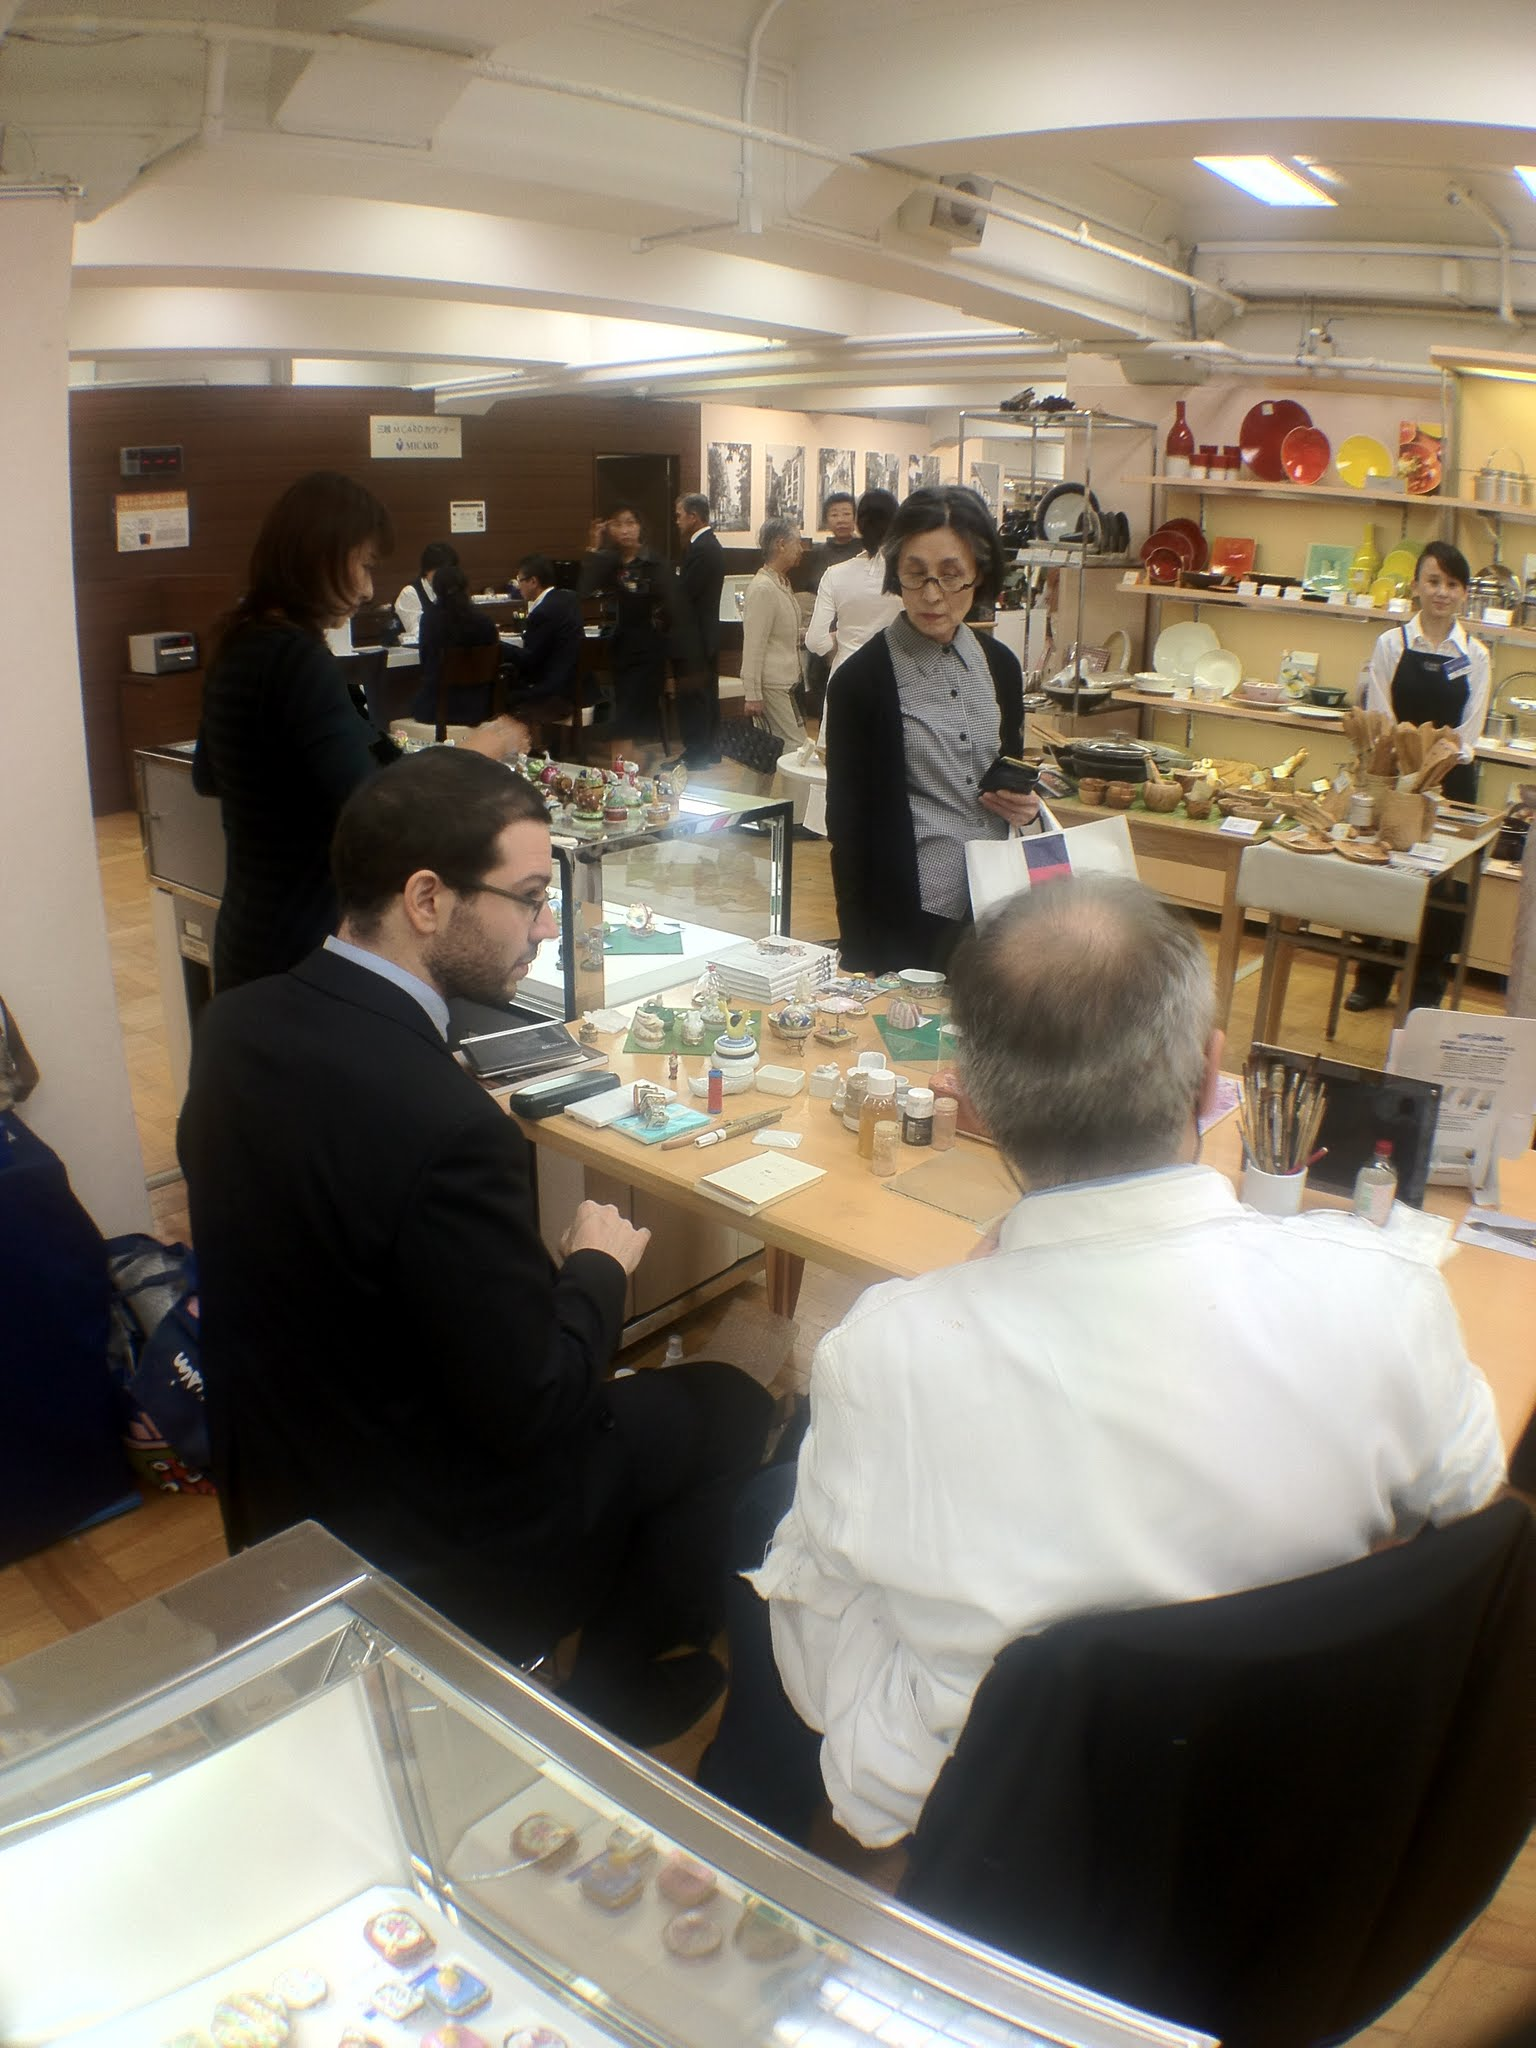 Photo: 左は通訳を務めてくれた早稲田大学博士課程のラモスさん。